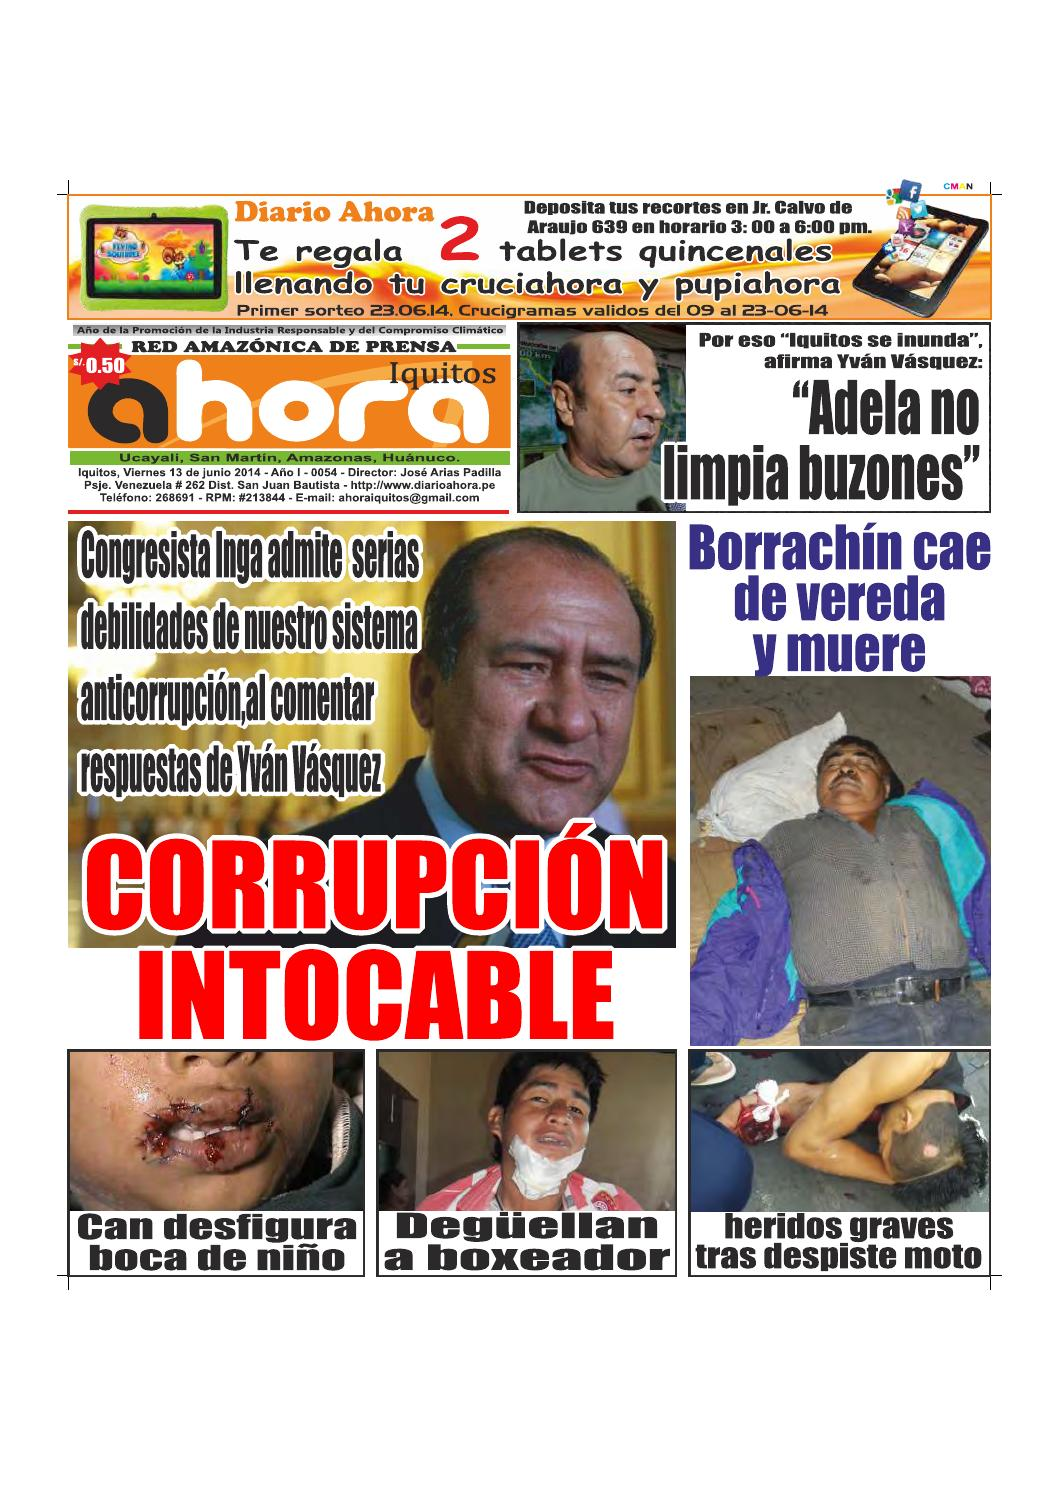 17 06 14 diario ahora iquitos by Jonatan Arias - issuu